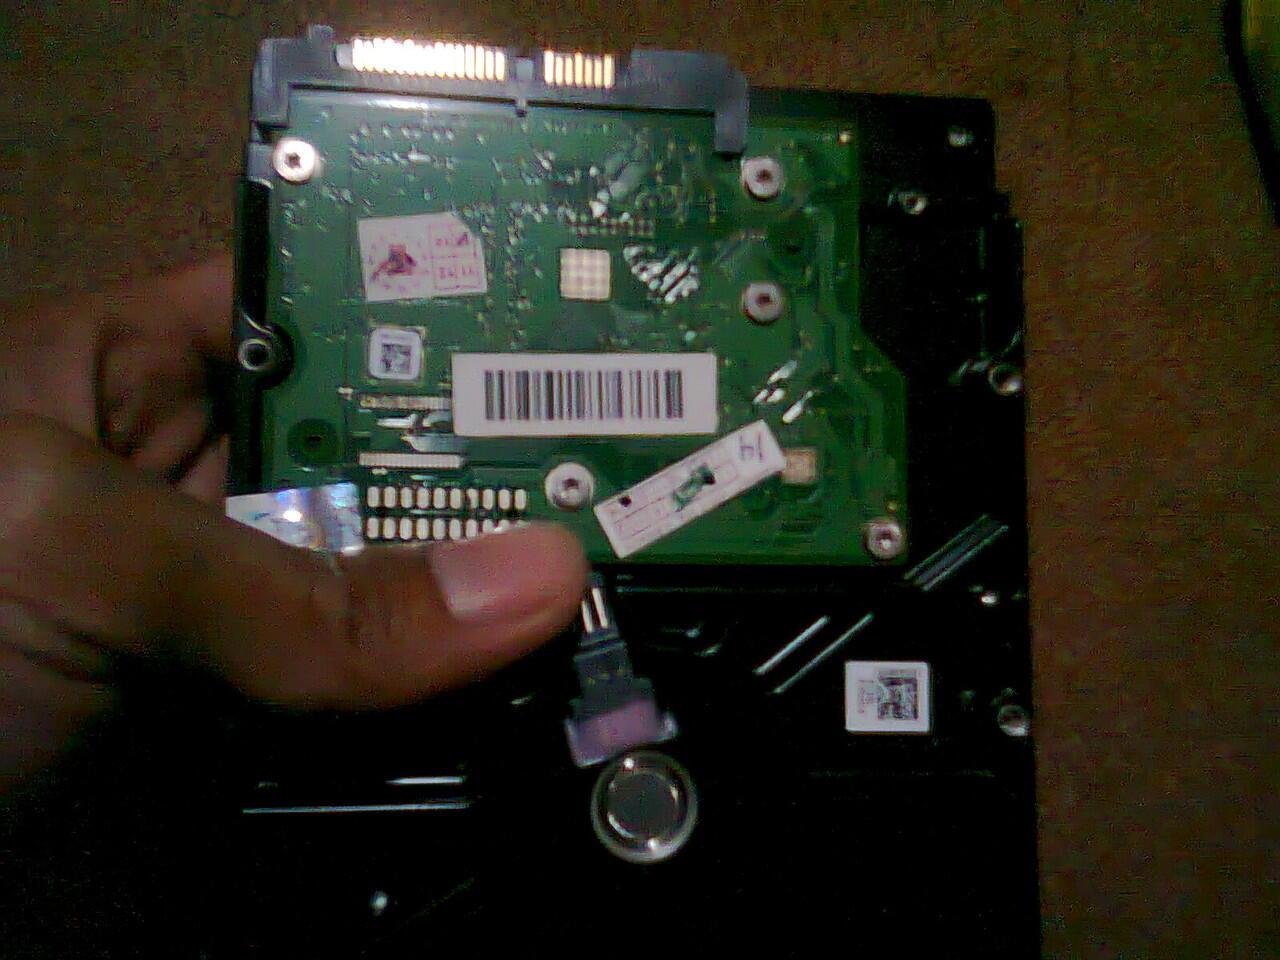 HARDISK PC 3.5 250GB SEAGATE BARACUDA 7200RPM